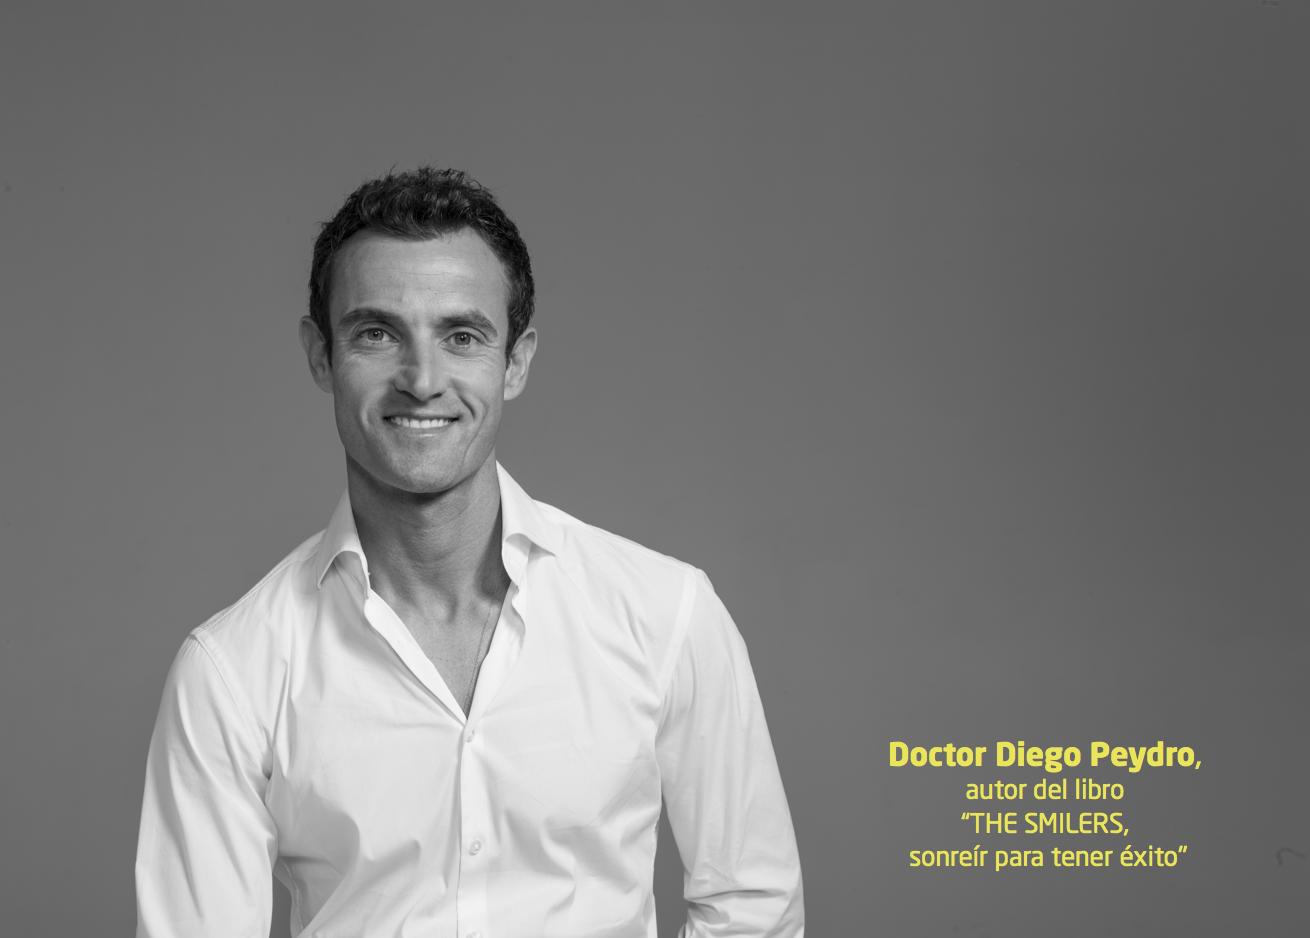 Doctor Diego Peydro